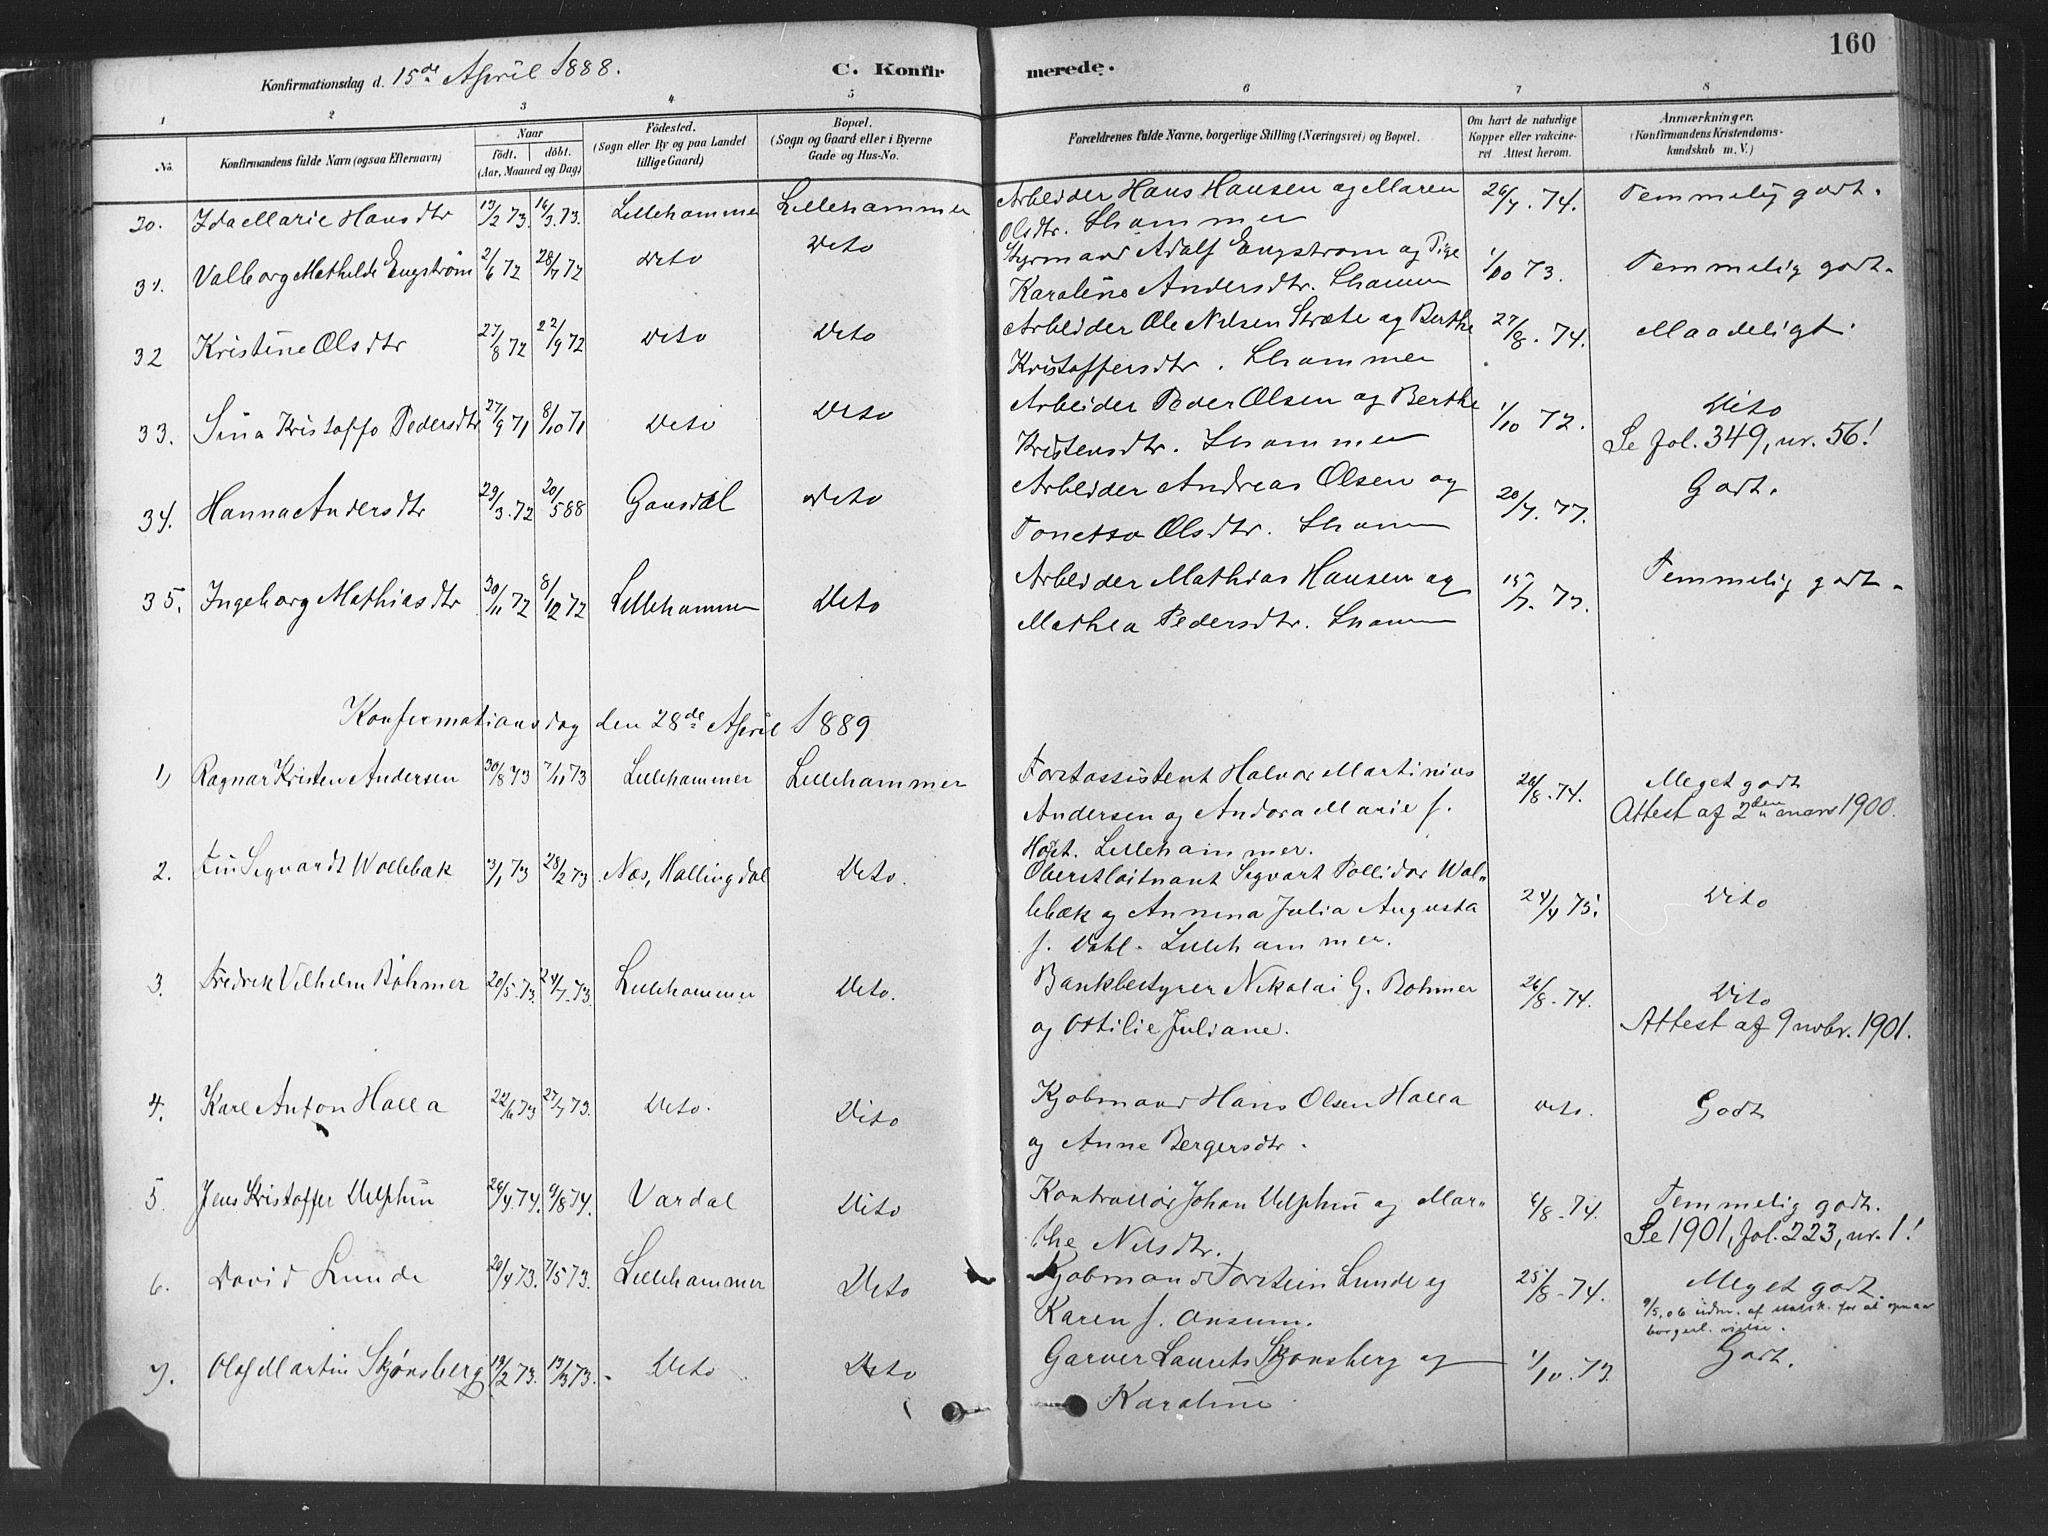 SAH, Fåberg prestekontor, H/Ha/Haa/L0010: Parish register (official) no. 10, 1879-1900, p. 160